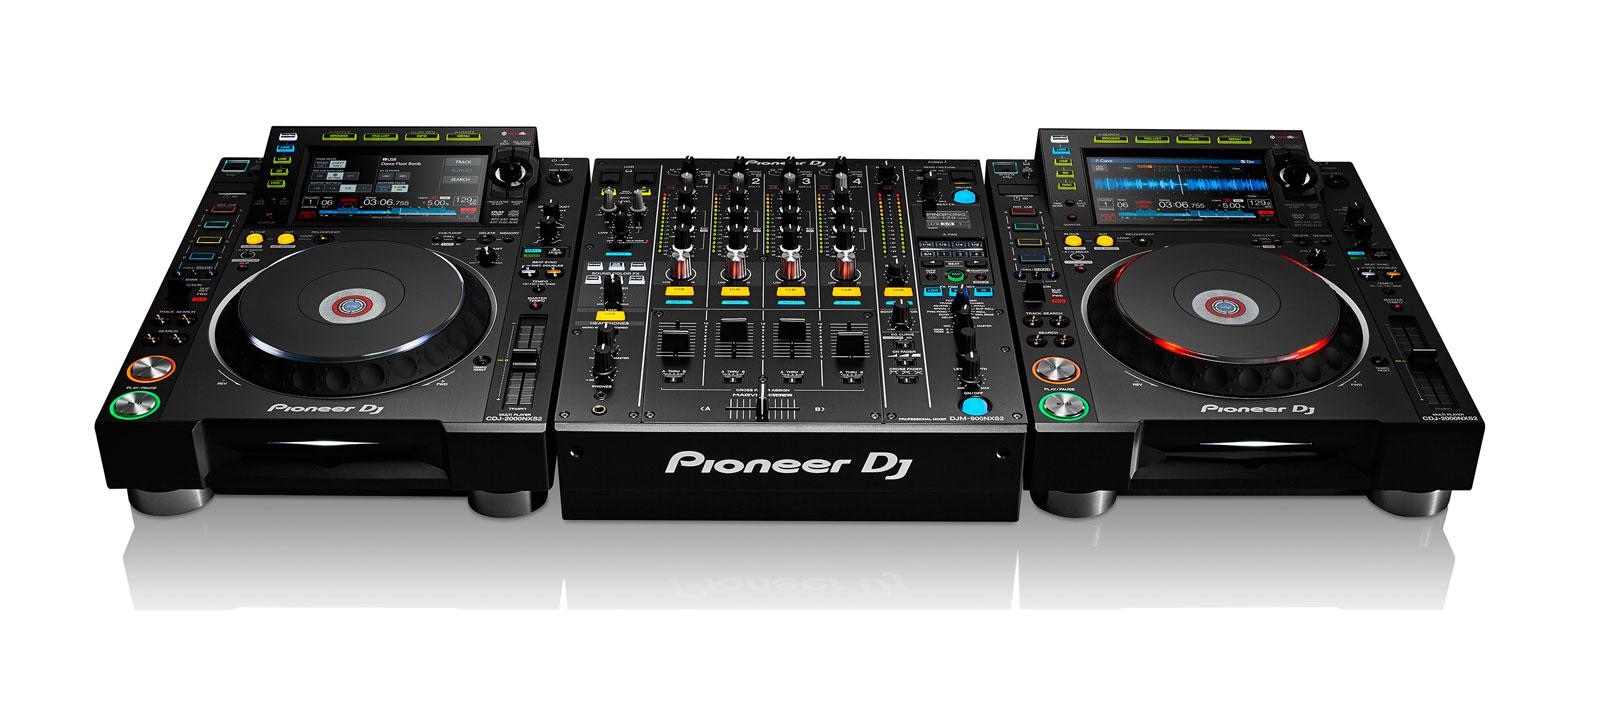 PIONEER+DJM+900+NEXUS+2-2